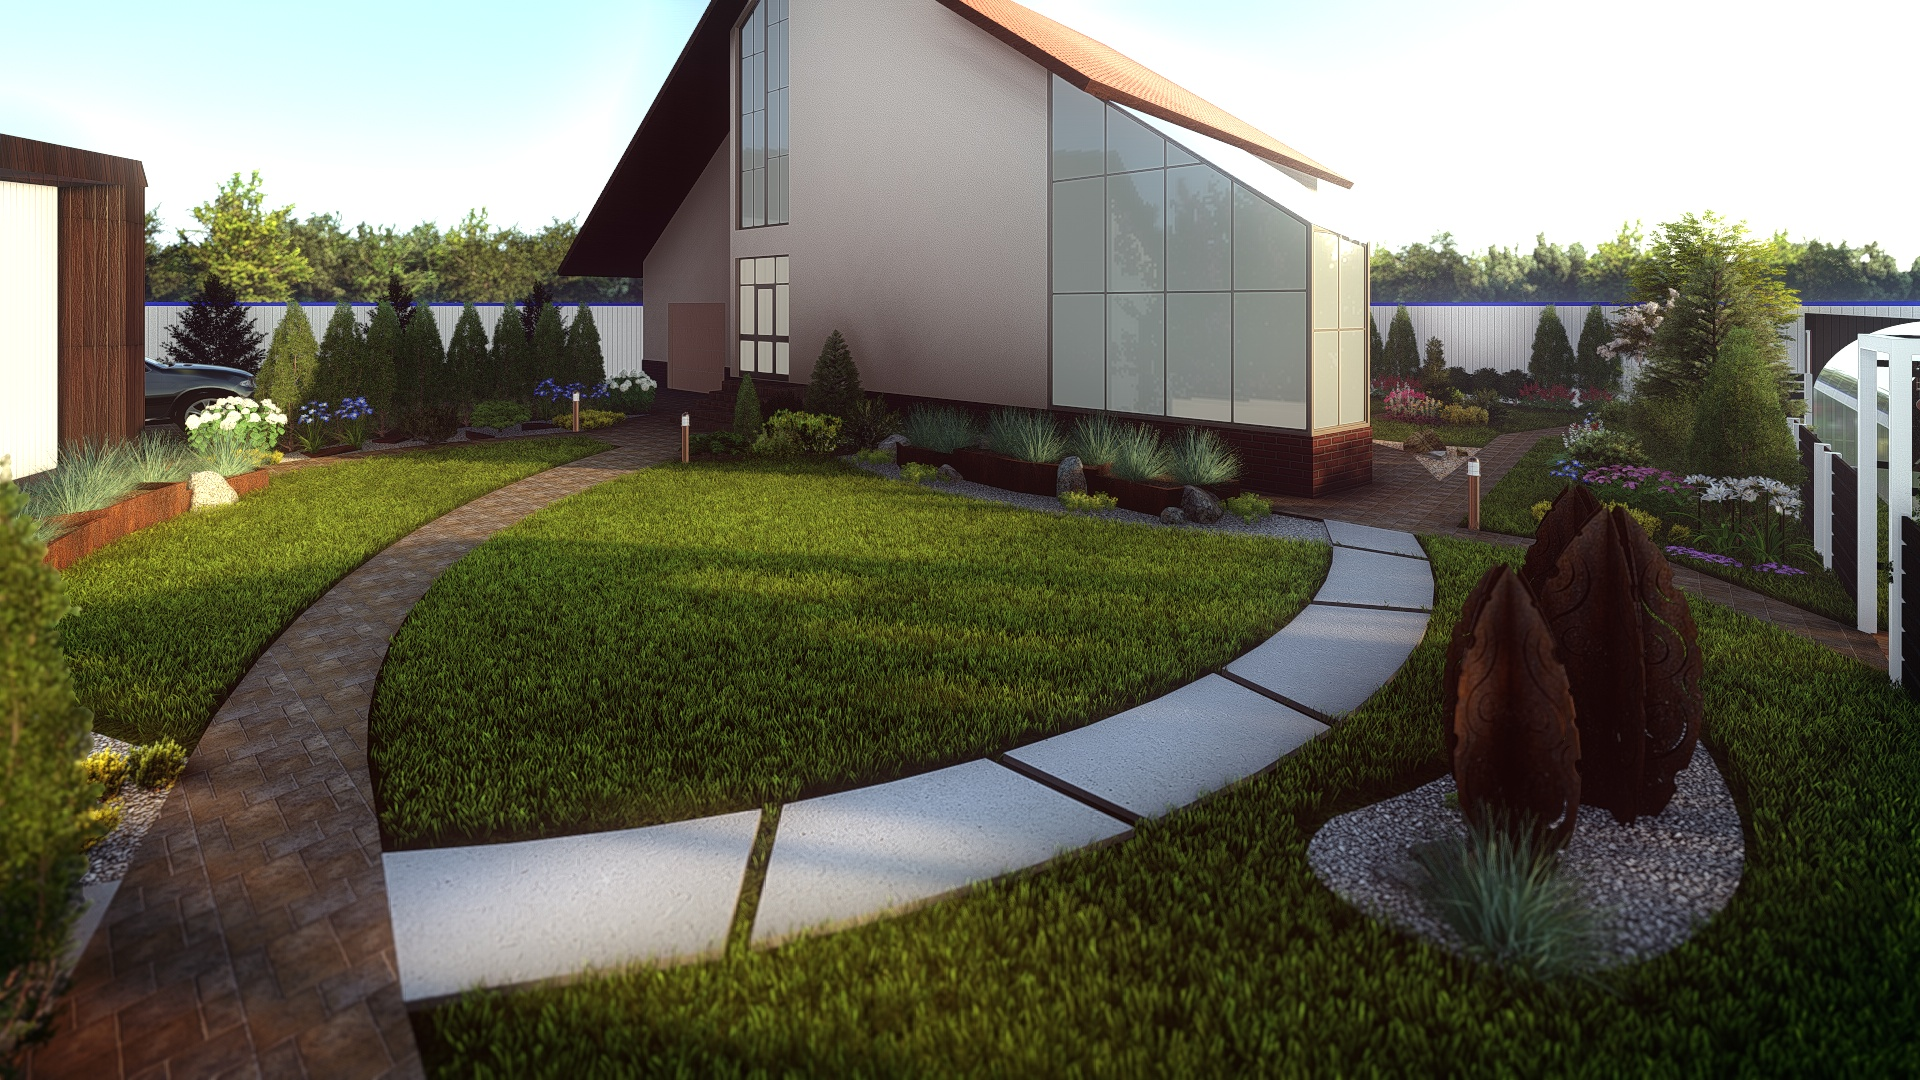 Проект по благоустройству  участка дворовой территории фото f_2875bbe1aeb27e34.jpg